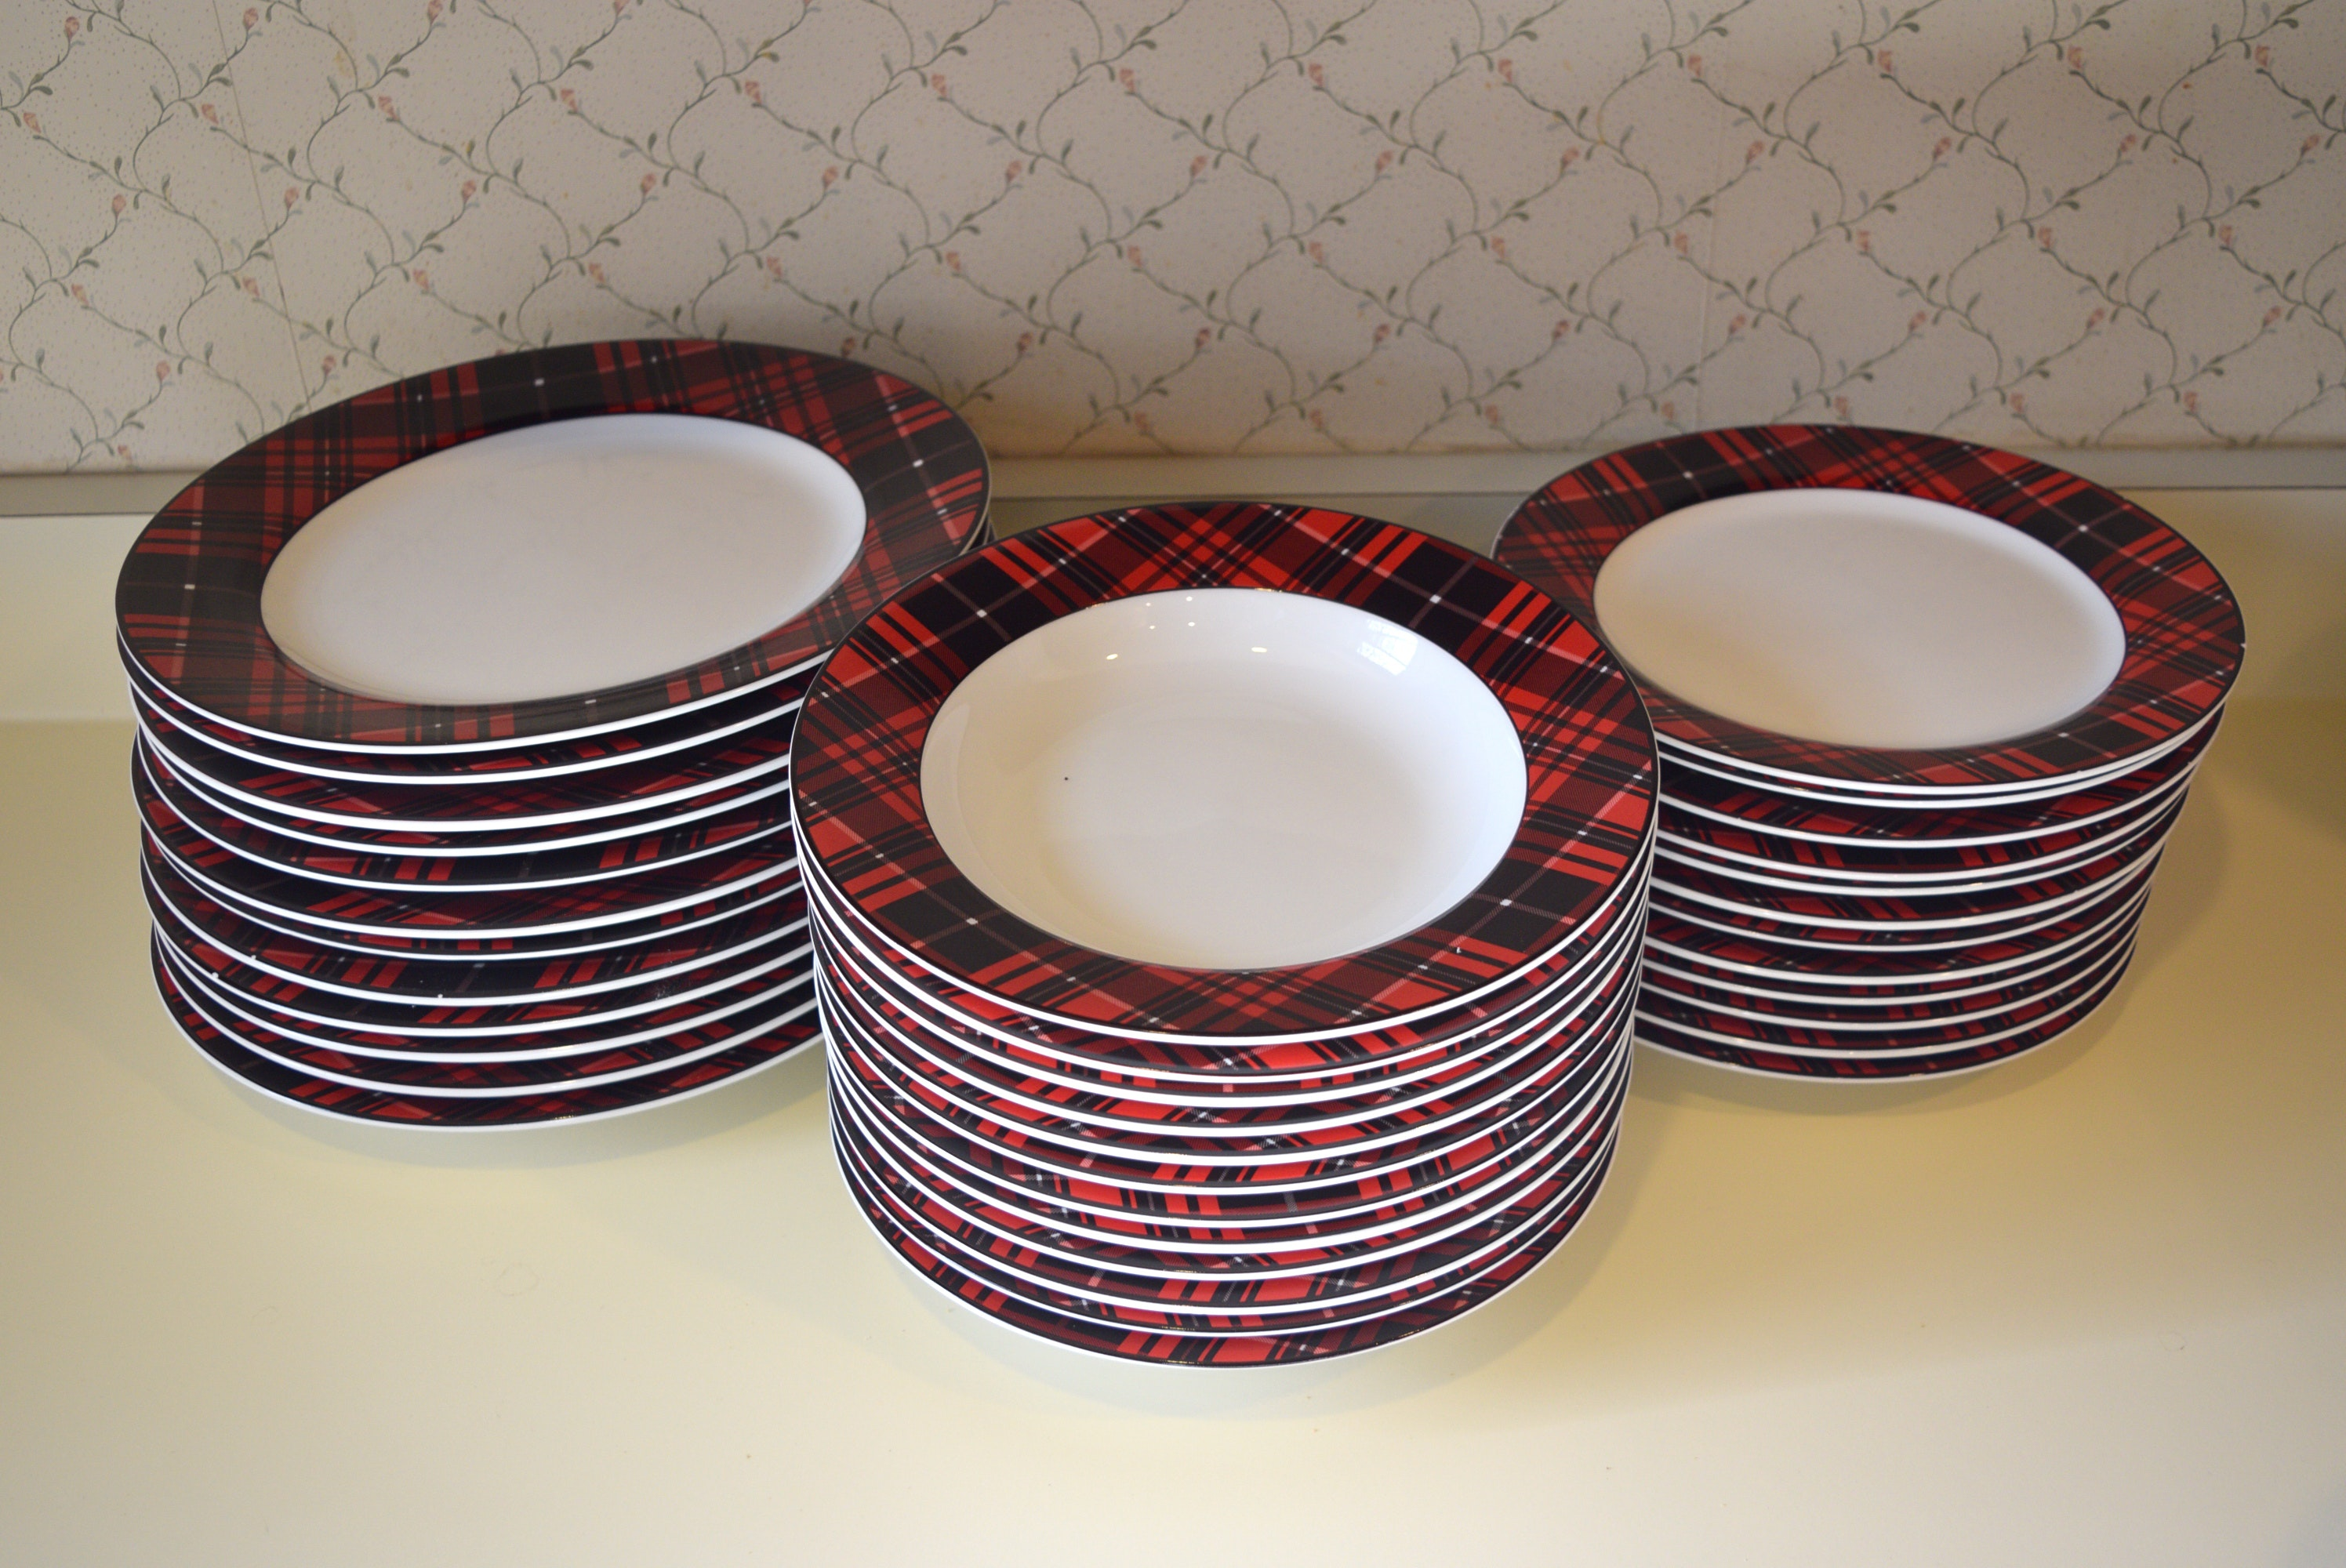 Porcelain Plaid Dinnerware for Twelve ... & Porcelain Plaid Dinnerware for Twelve : EBTH